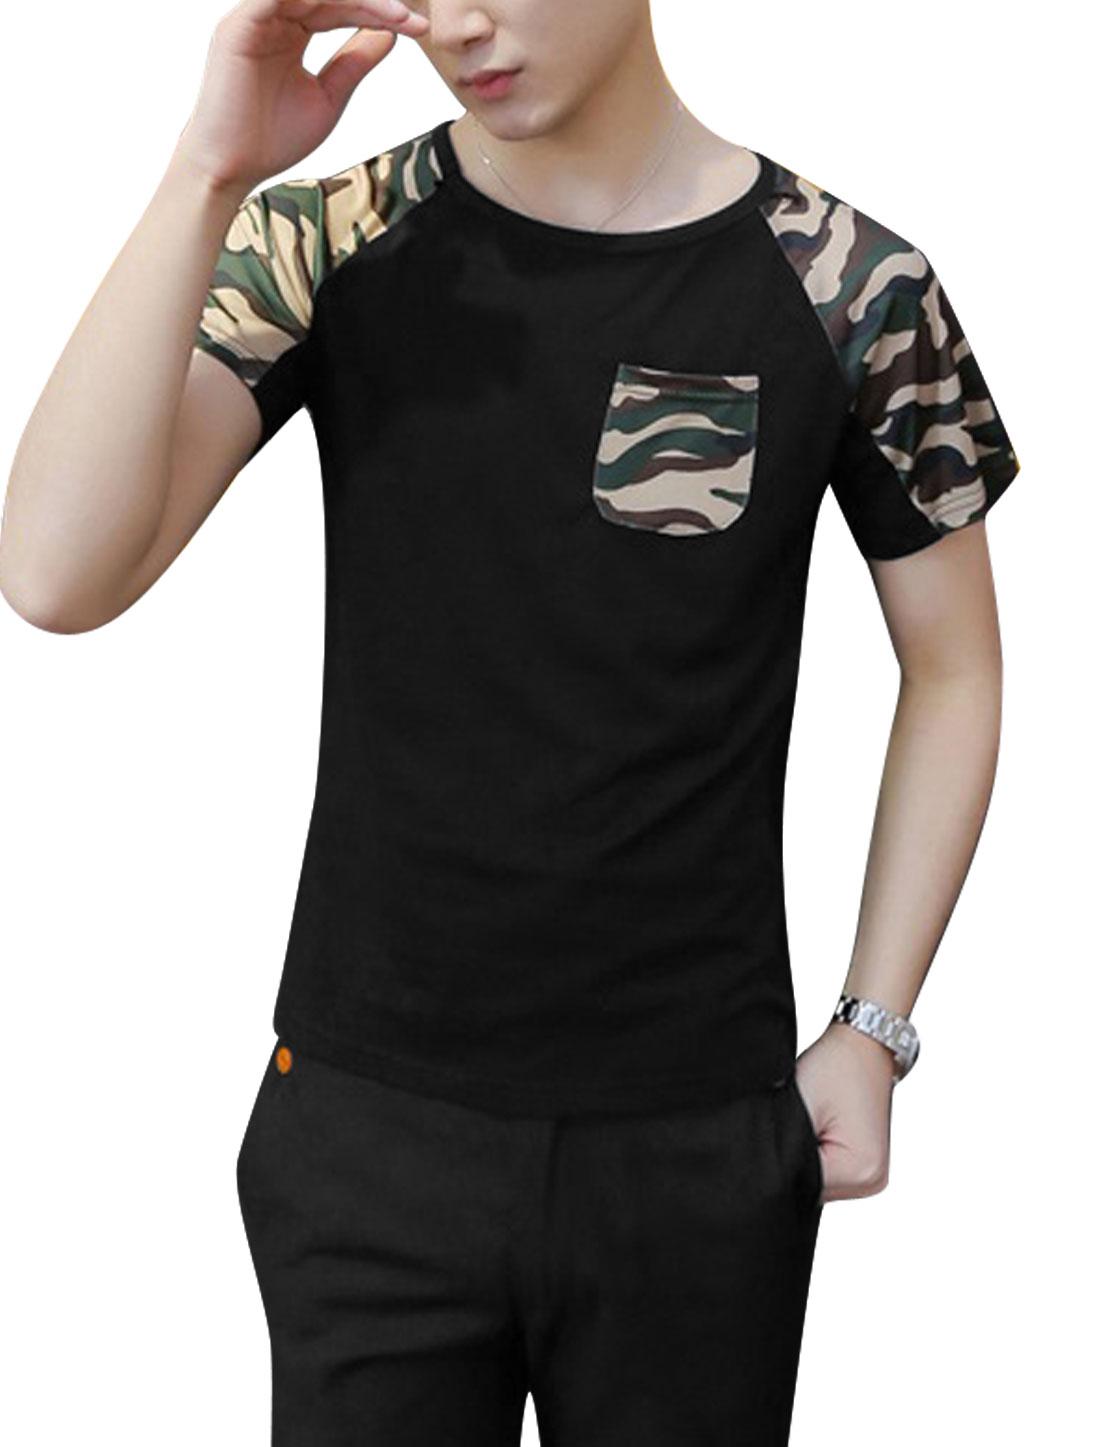 Men Casual Short Raglan Sleeve Camouflage Prints T-Shirt Black S